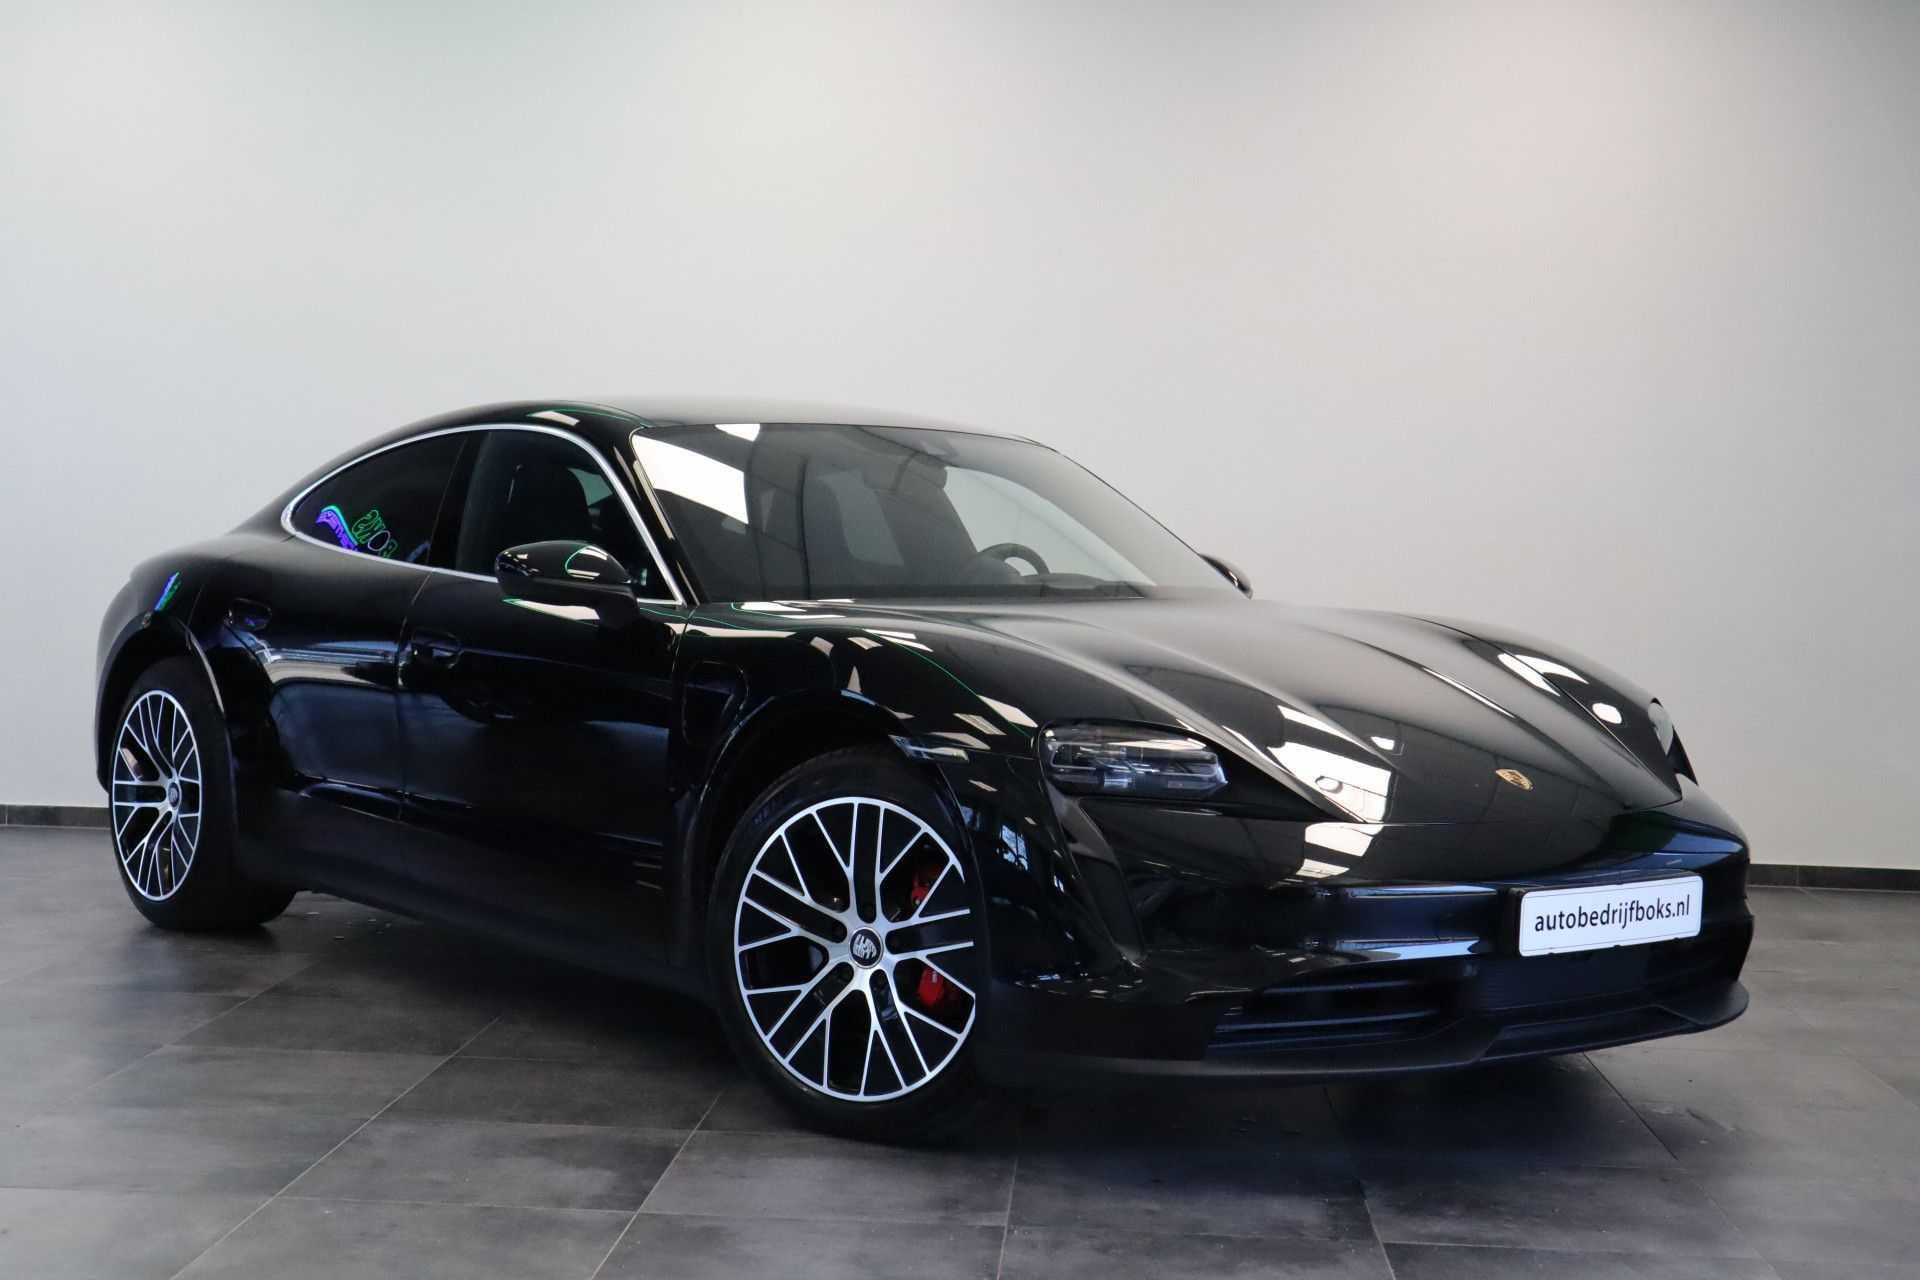 Porsche Taycan 4S Performance 571pk! | Prijs ex.btw 102.950,- | Full-Led Sport-Chrono Panoramadak Warmtepomp